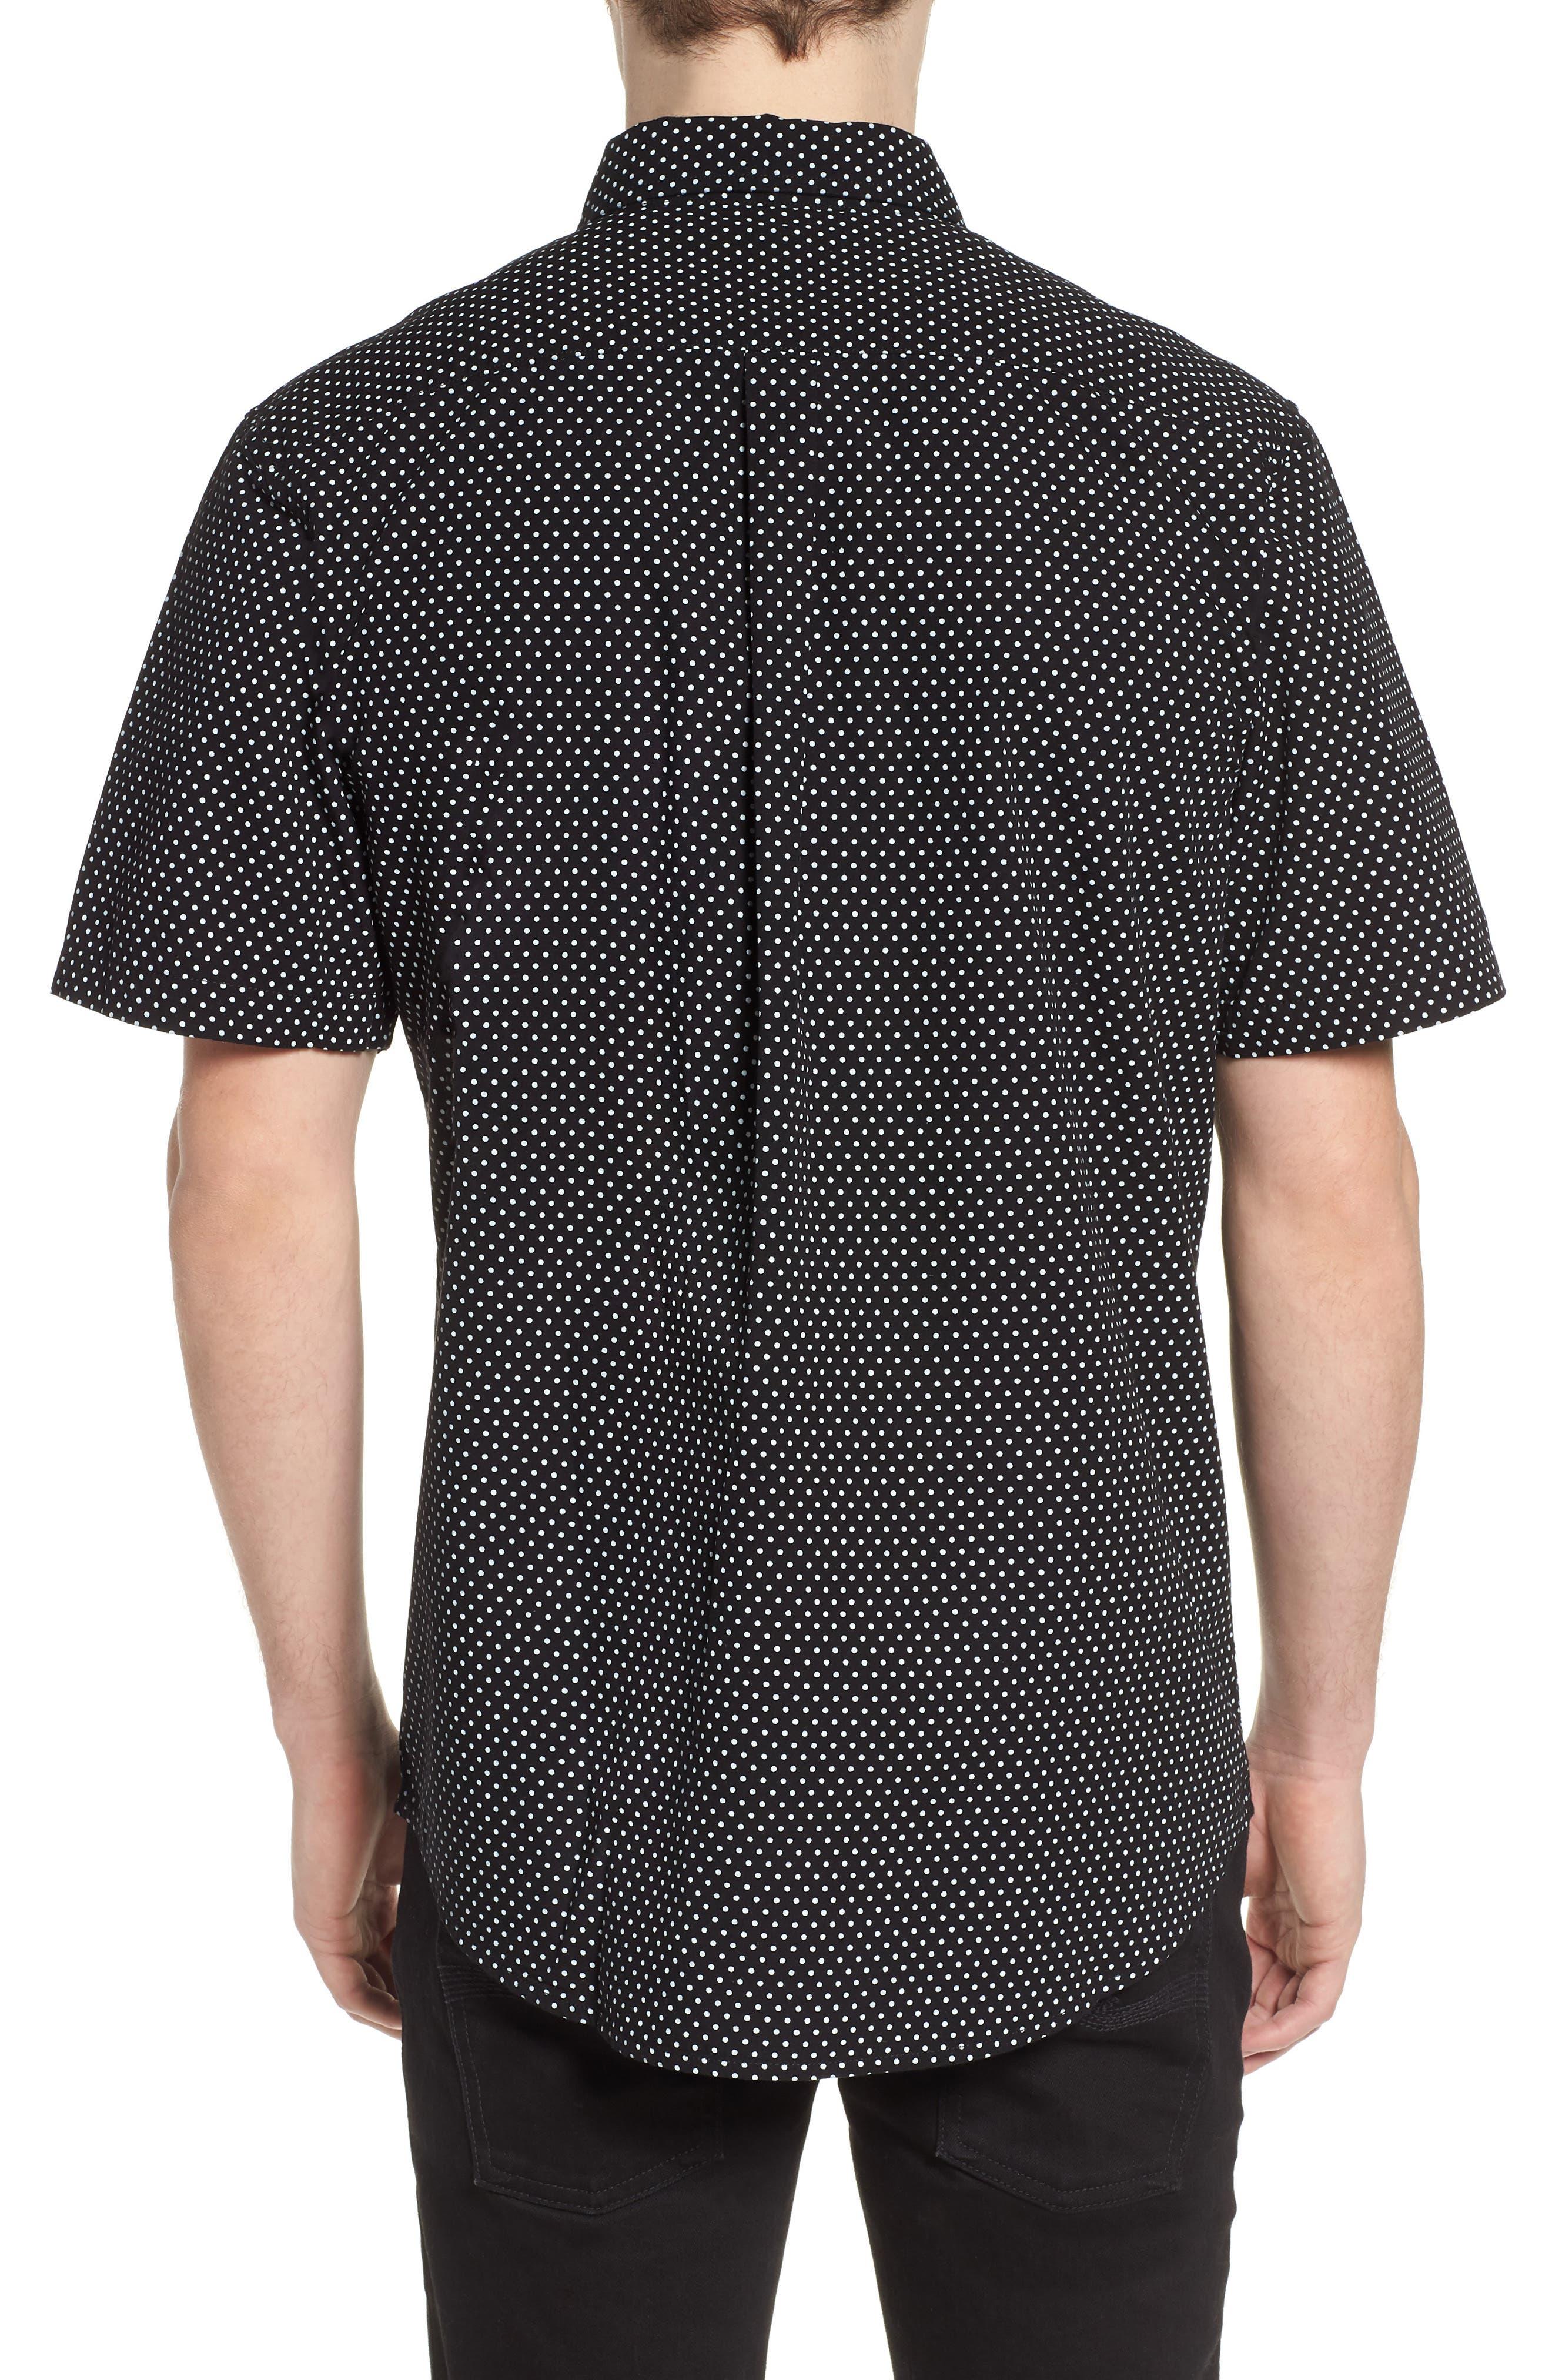 Brozwell Short Sleeve Shirt,                             Alternate thumbnail 2, color,                             001